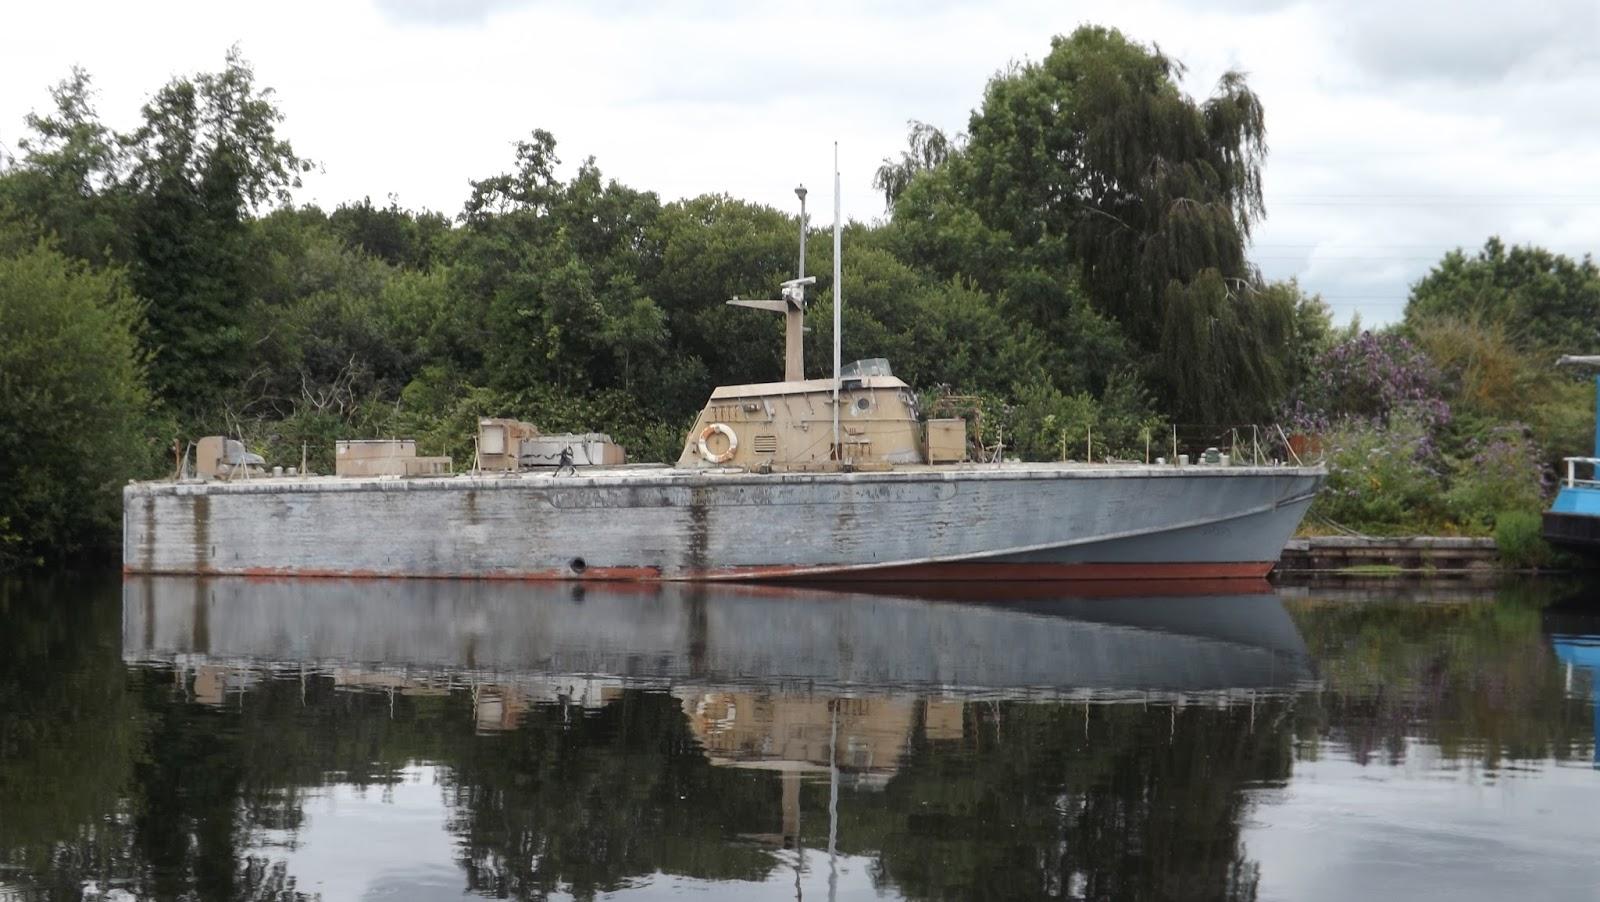 Jj 39 S Wargames Wwii British Motor Torpedo Boat Exeter Canal